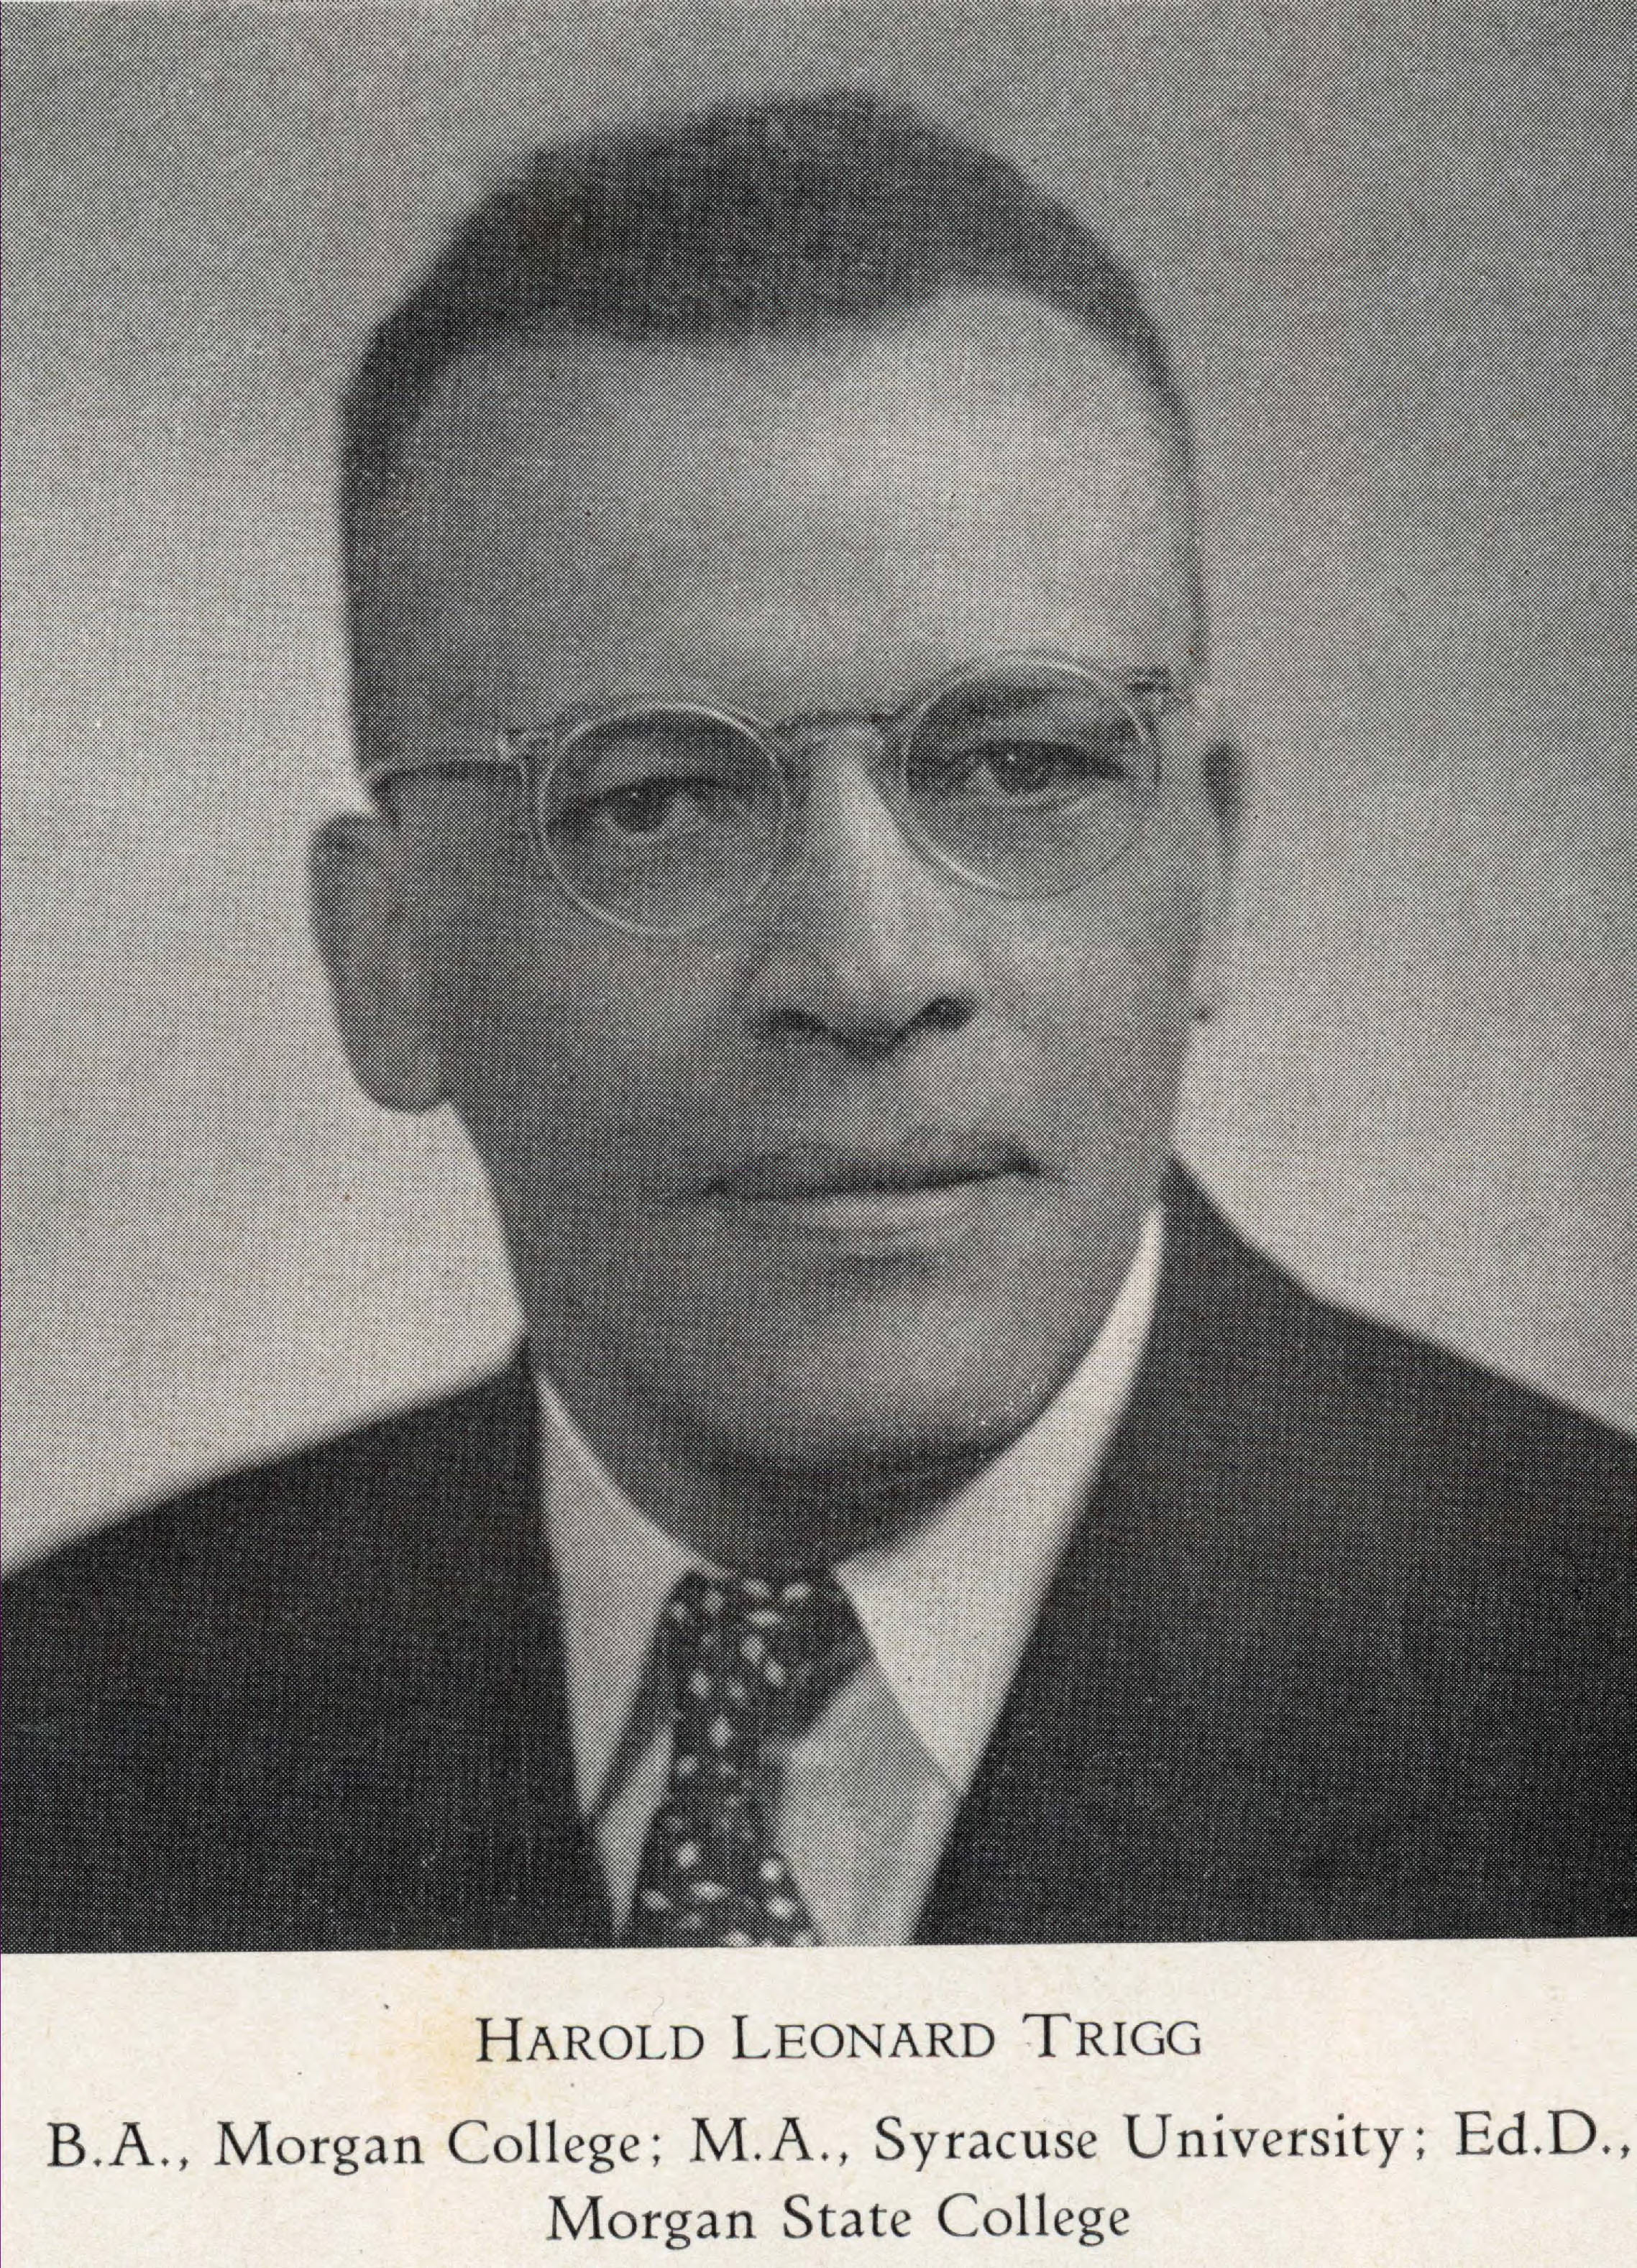 Harold Leonard Trigg, credit: ECSU Archives